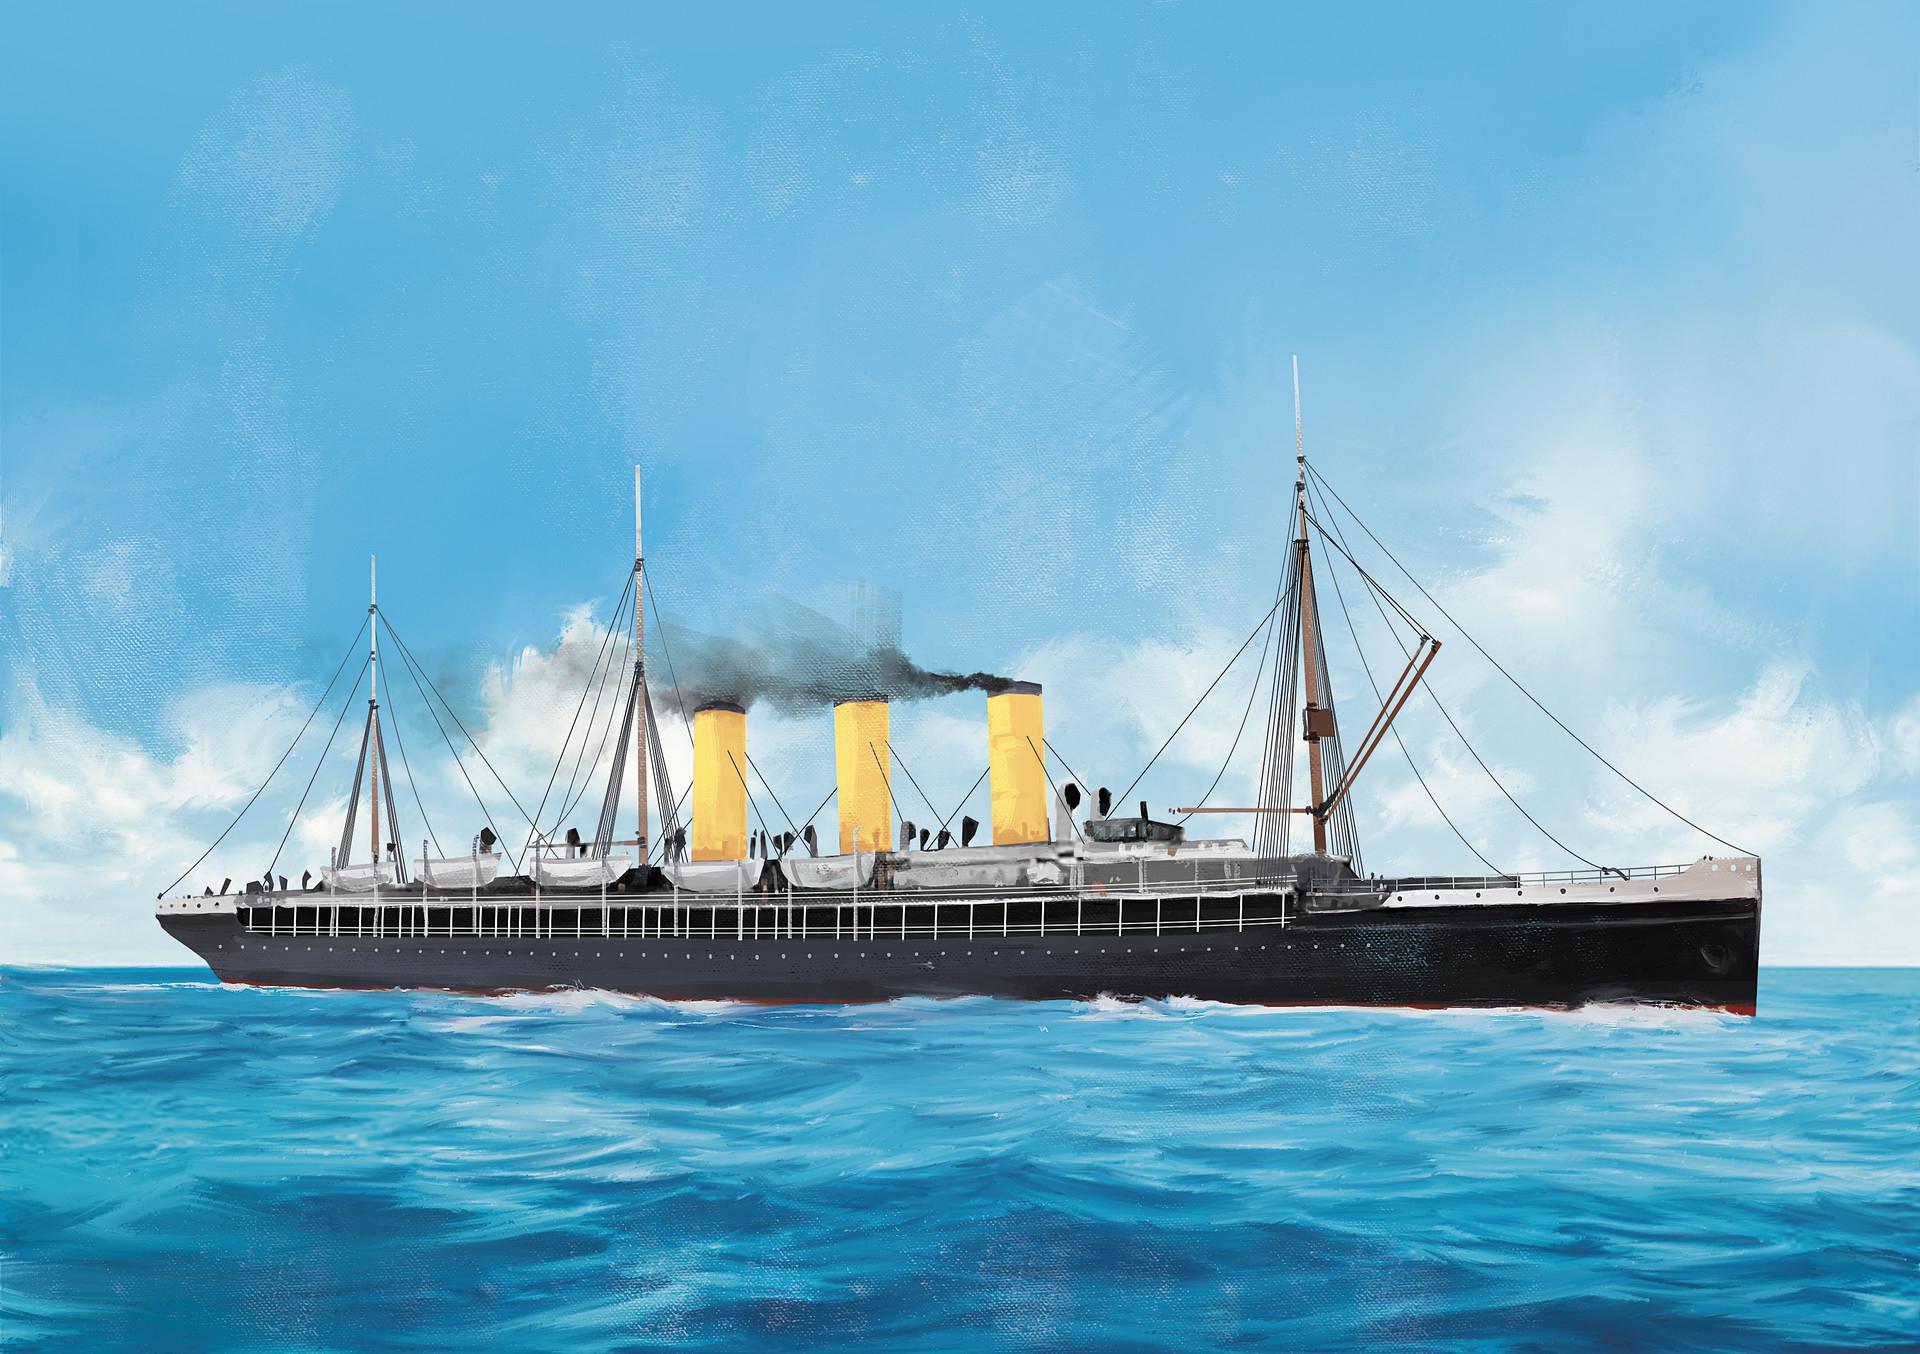 Dominik mayer 1889 augusta victoria 03